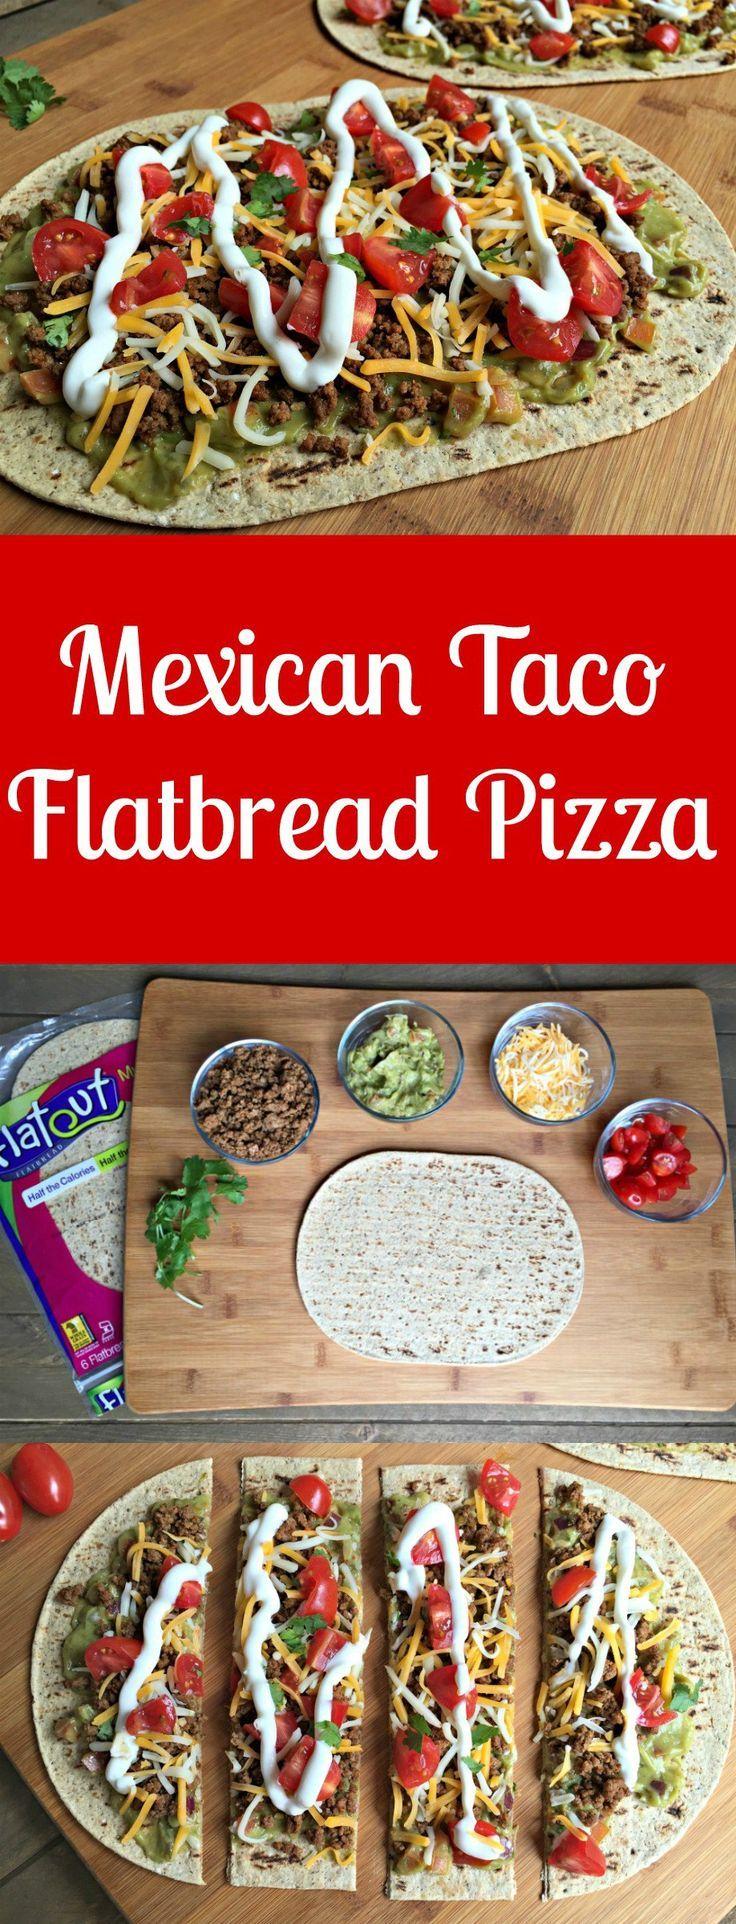 Mexican taco flatbread pizza with flatout